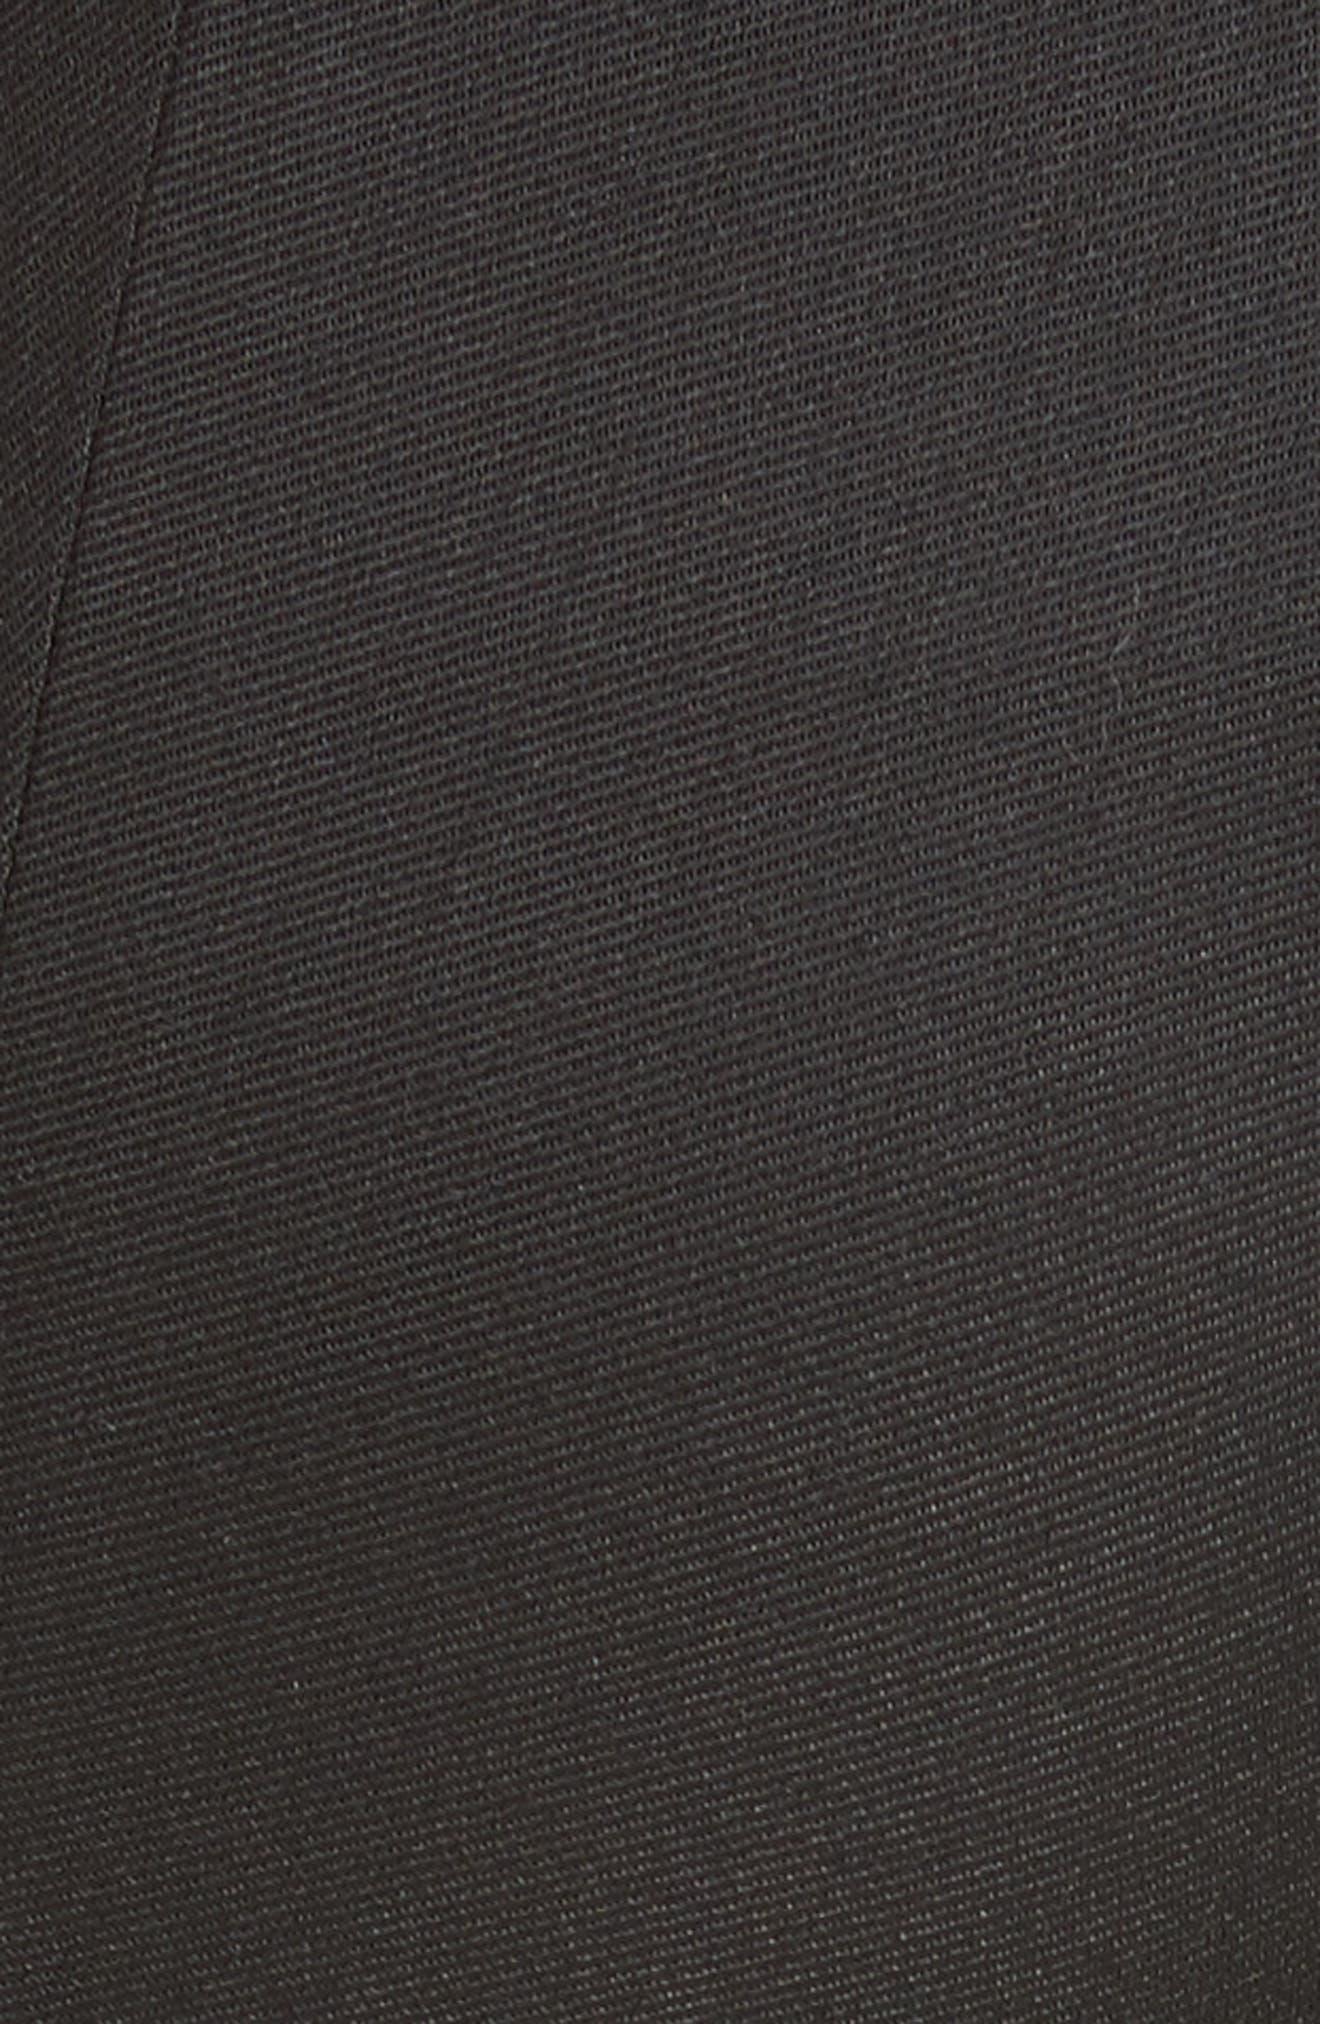 Wool Blend Skinny Pants,                             Alternate thumbnail 5, color,                             001